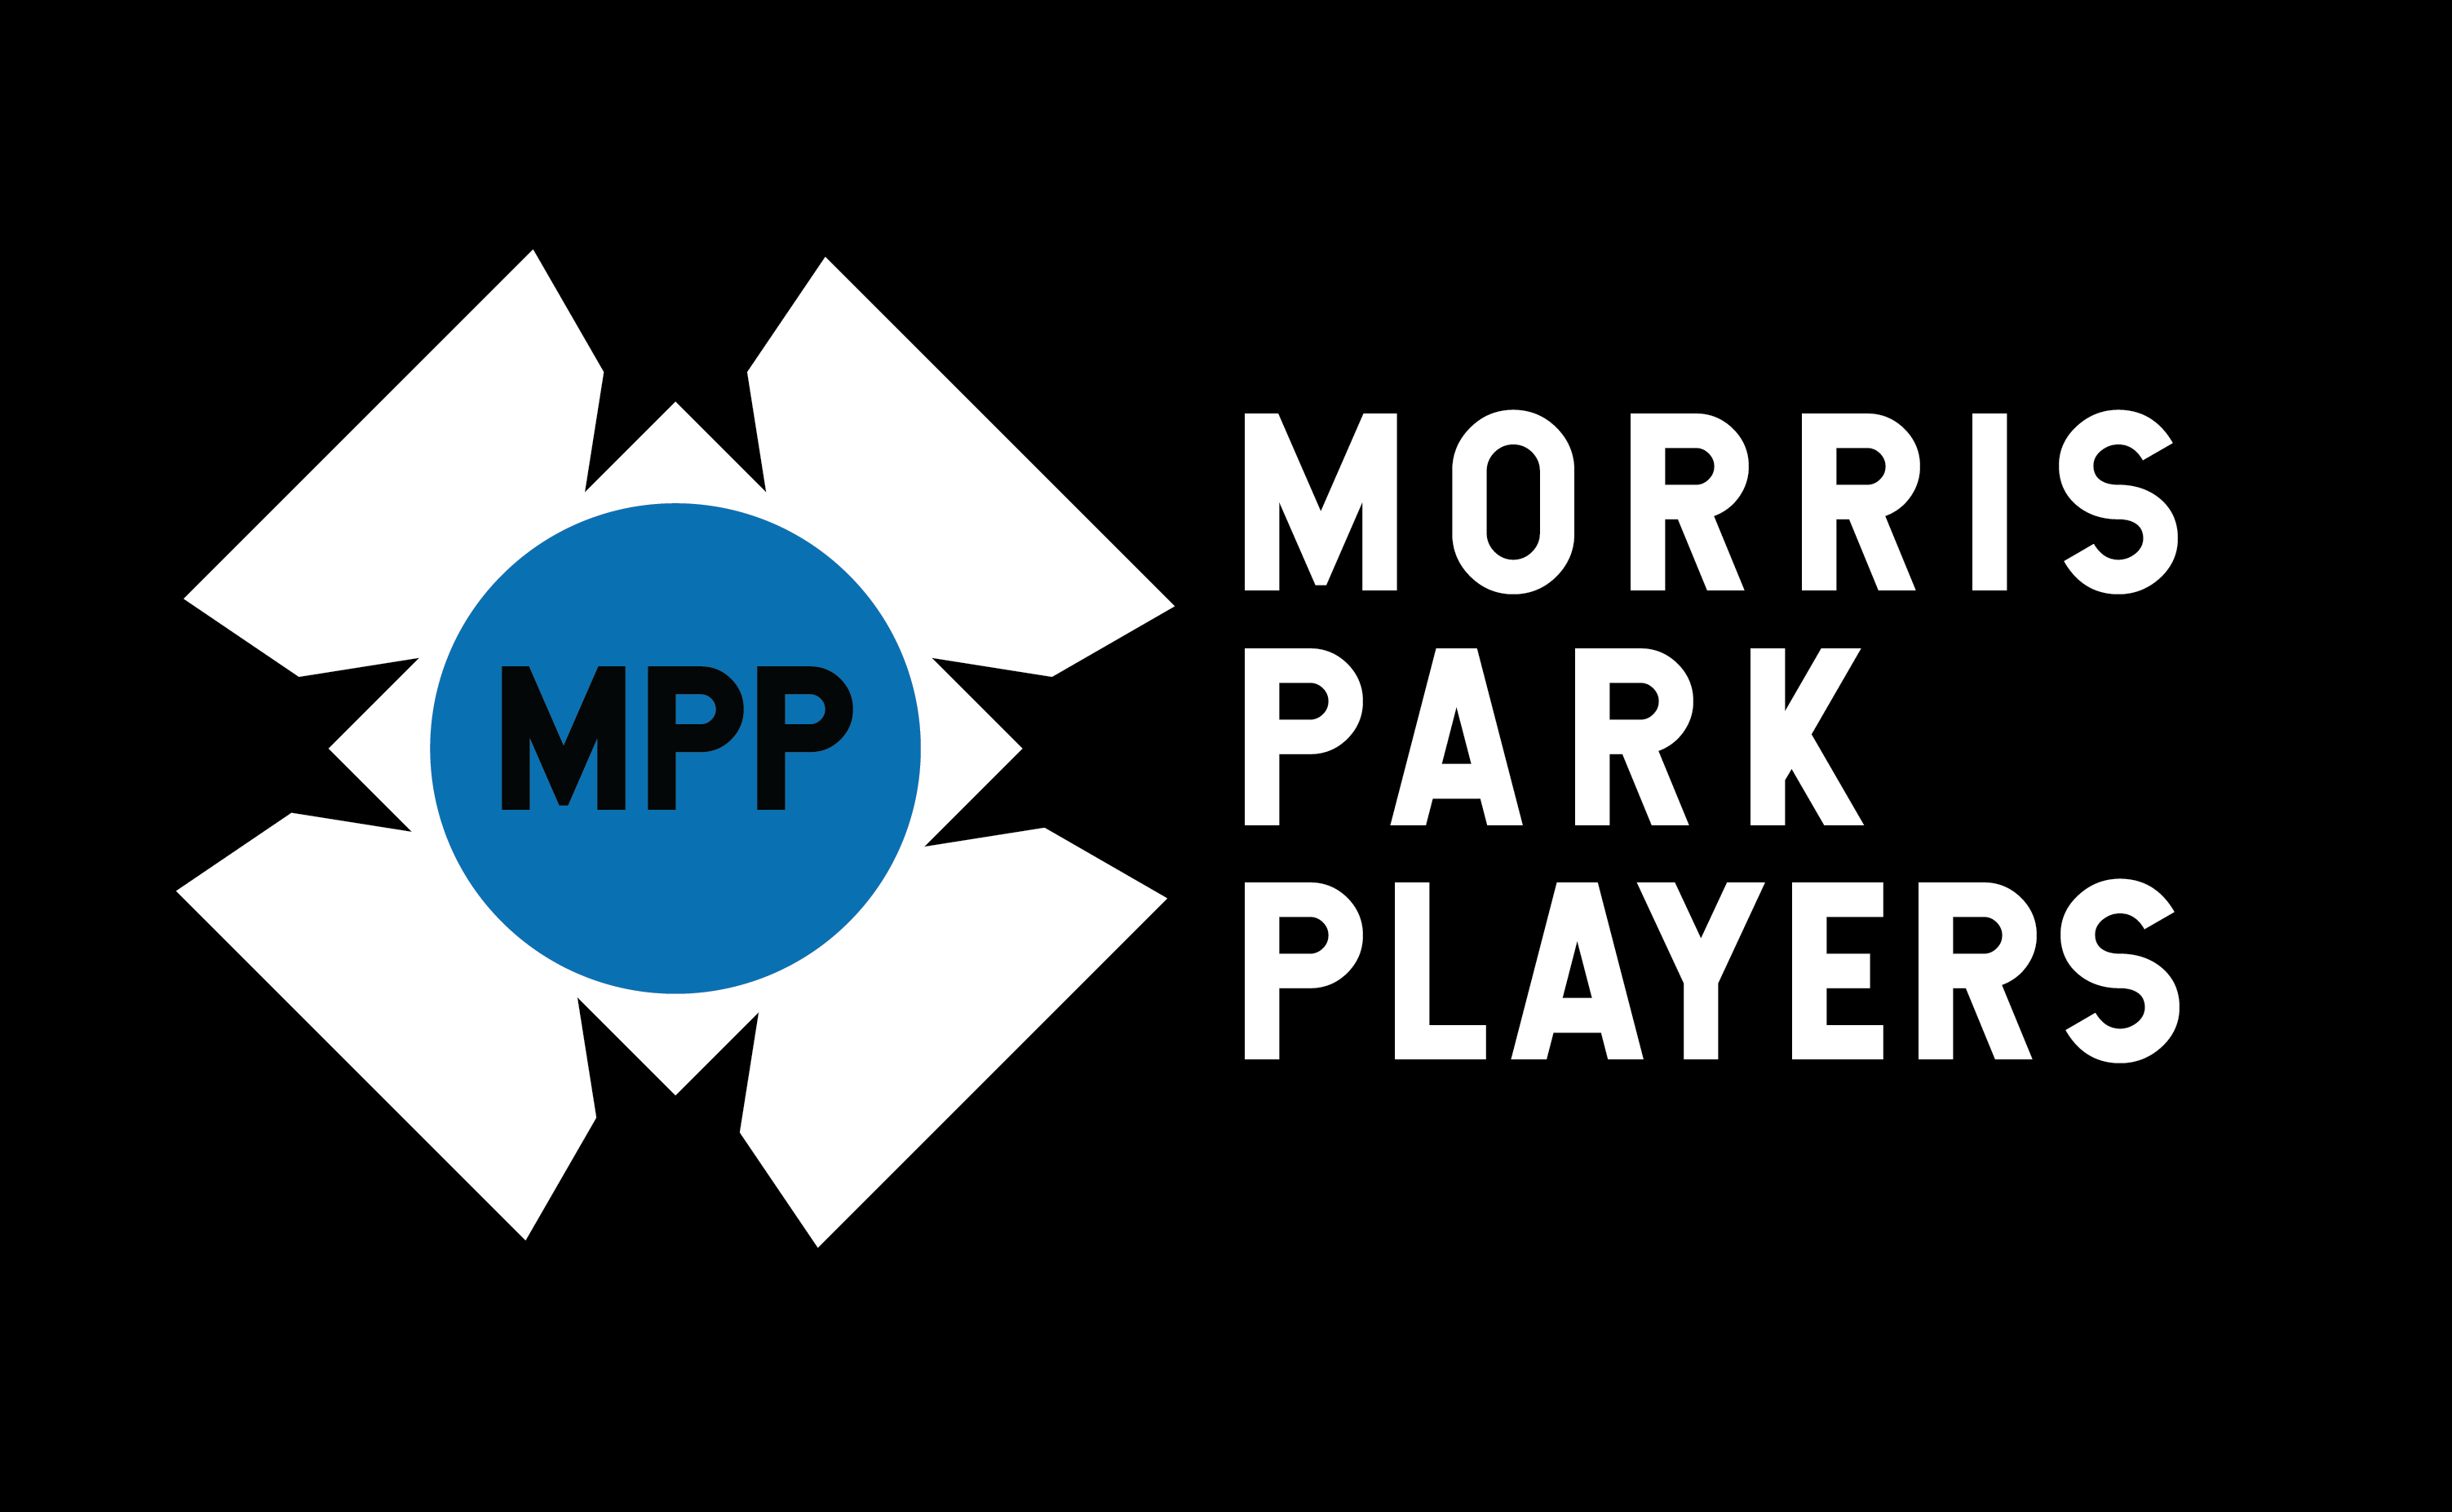 Morris Park Players